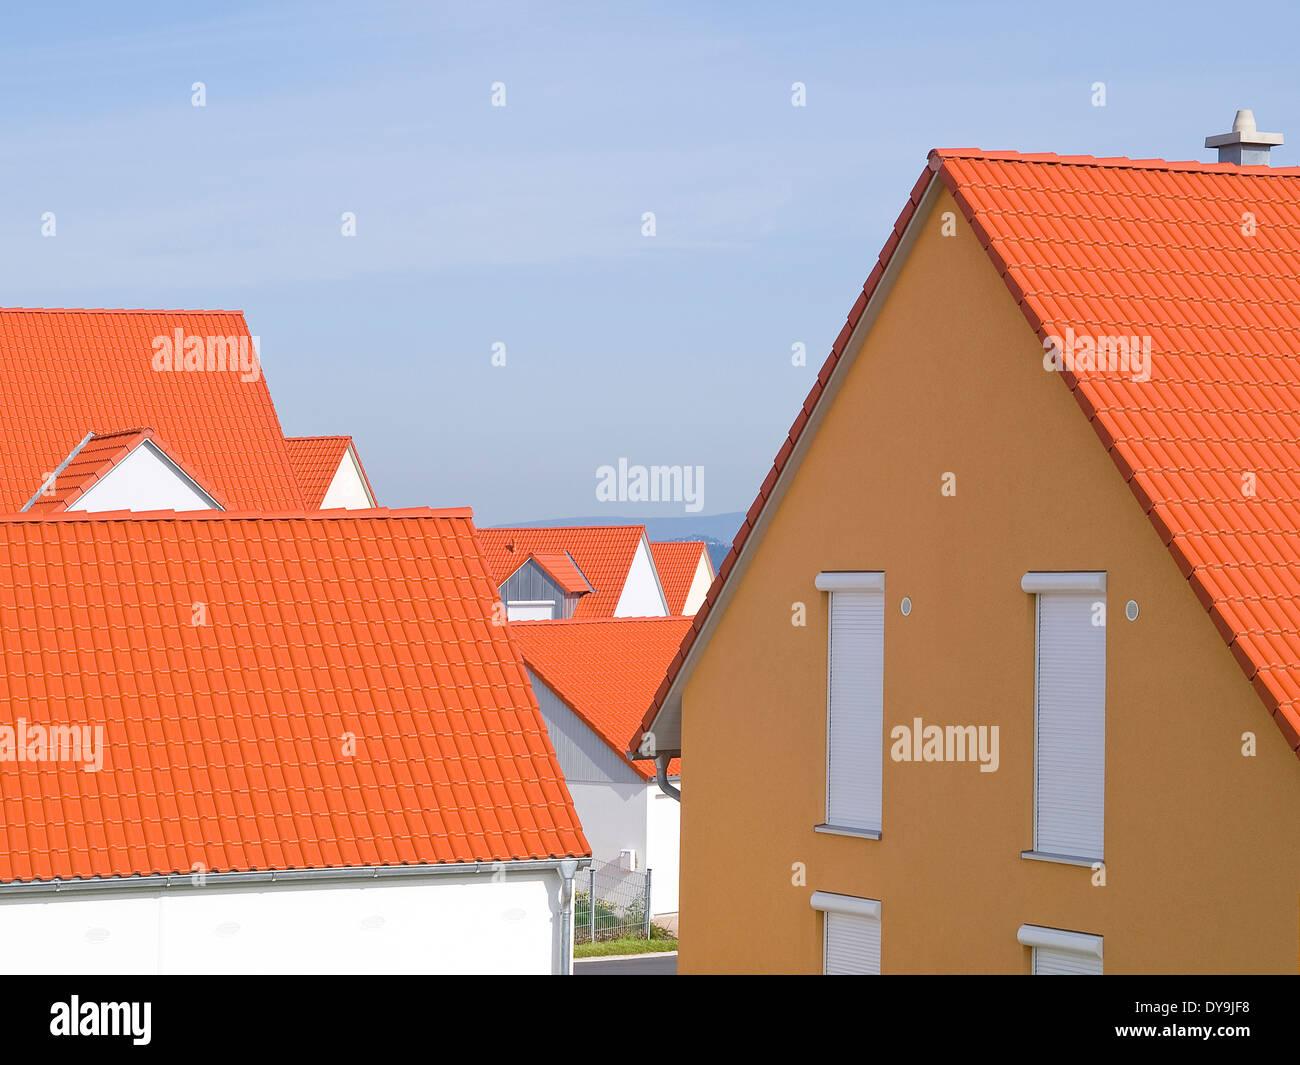 Residential area Netzaberg, Eschenbach in der Oberpfalz, Bavaria, Germany - Stock Image